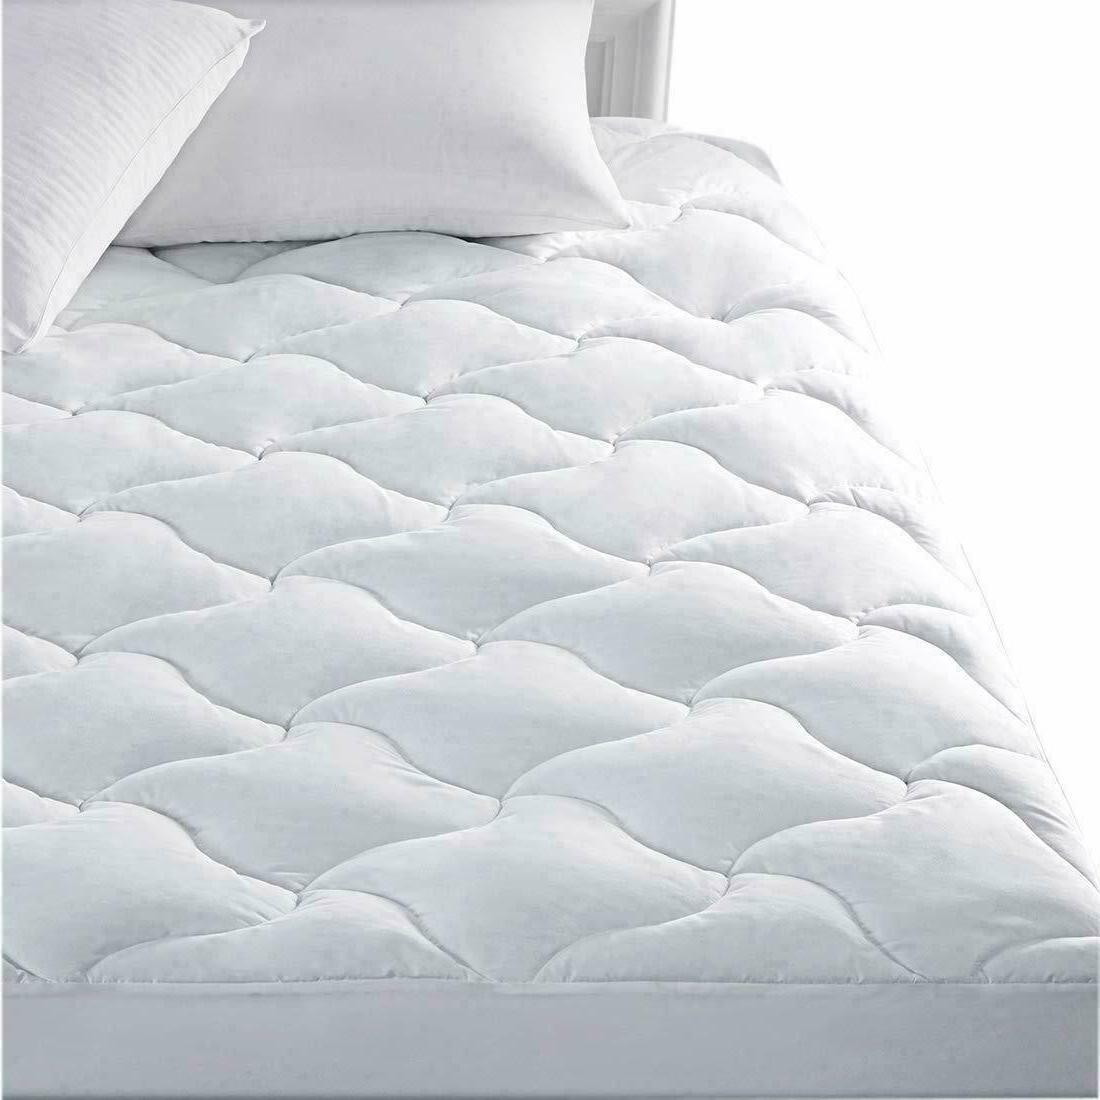 cal king size mattress pad cover pillow